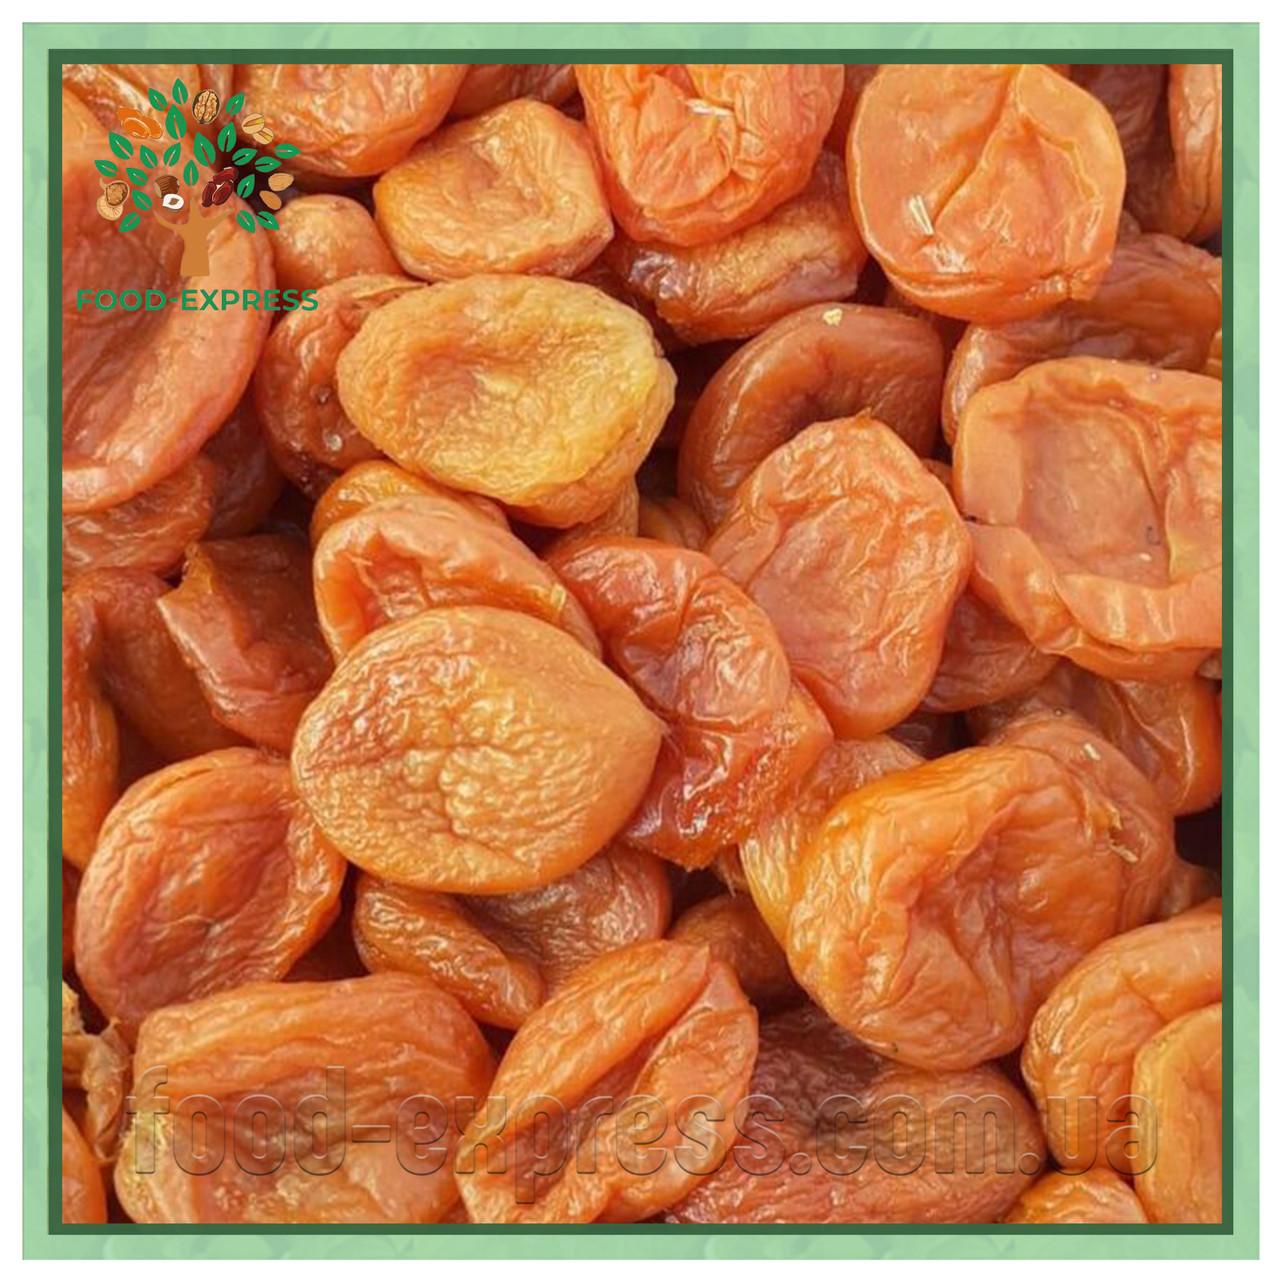 Курага желтая Таджикистан 200 г, Сухофрукты из абрикоса, сушеный абрикос жёлтый